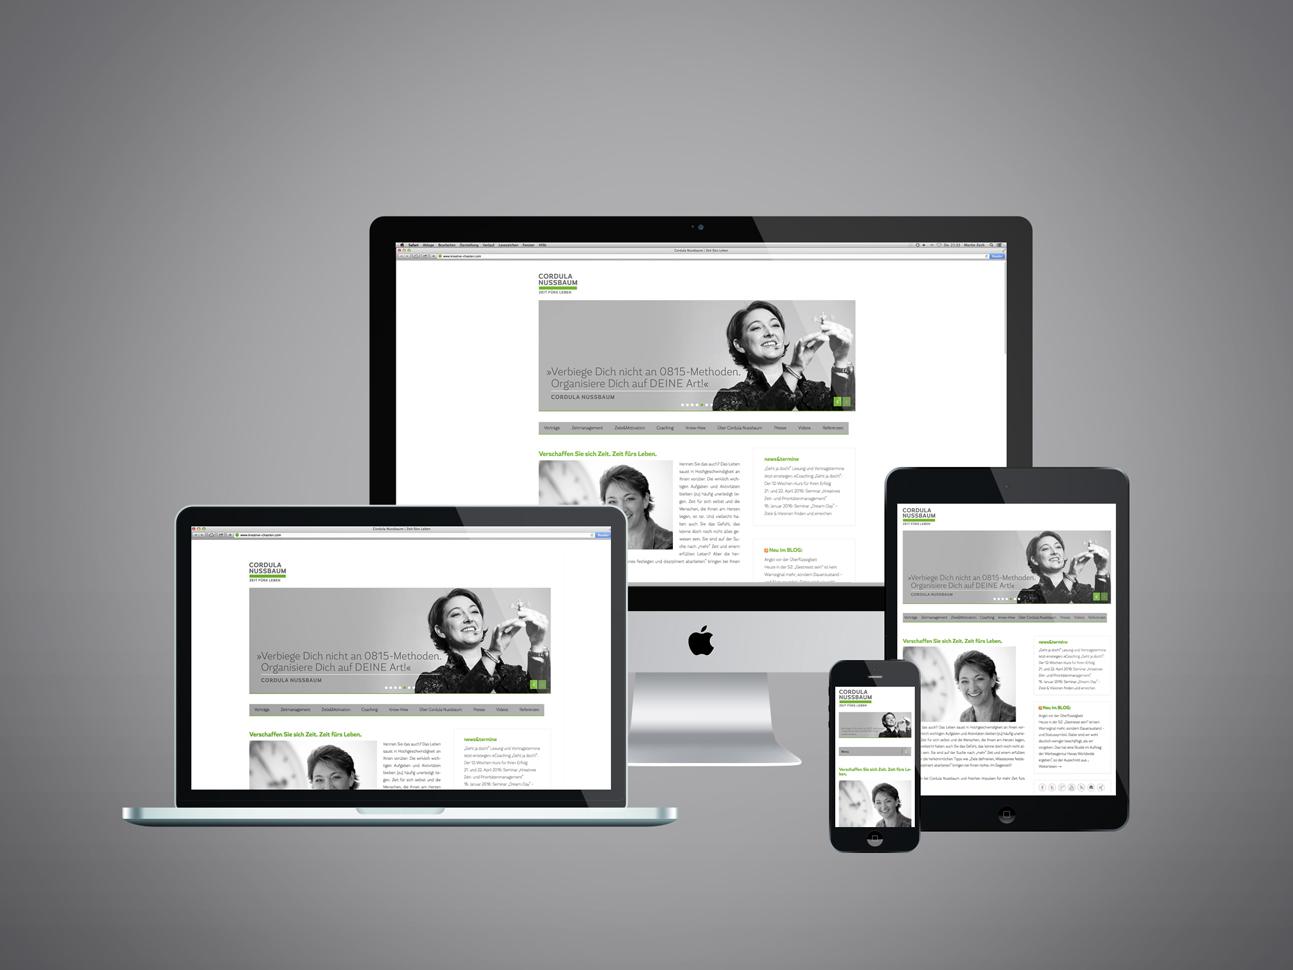 martin_zech_design_corporate_design_cordula_nussbaum_landing_page